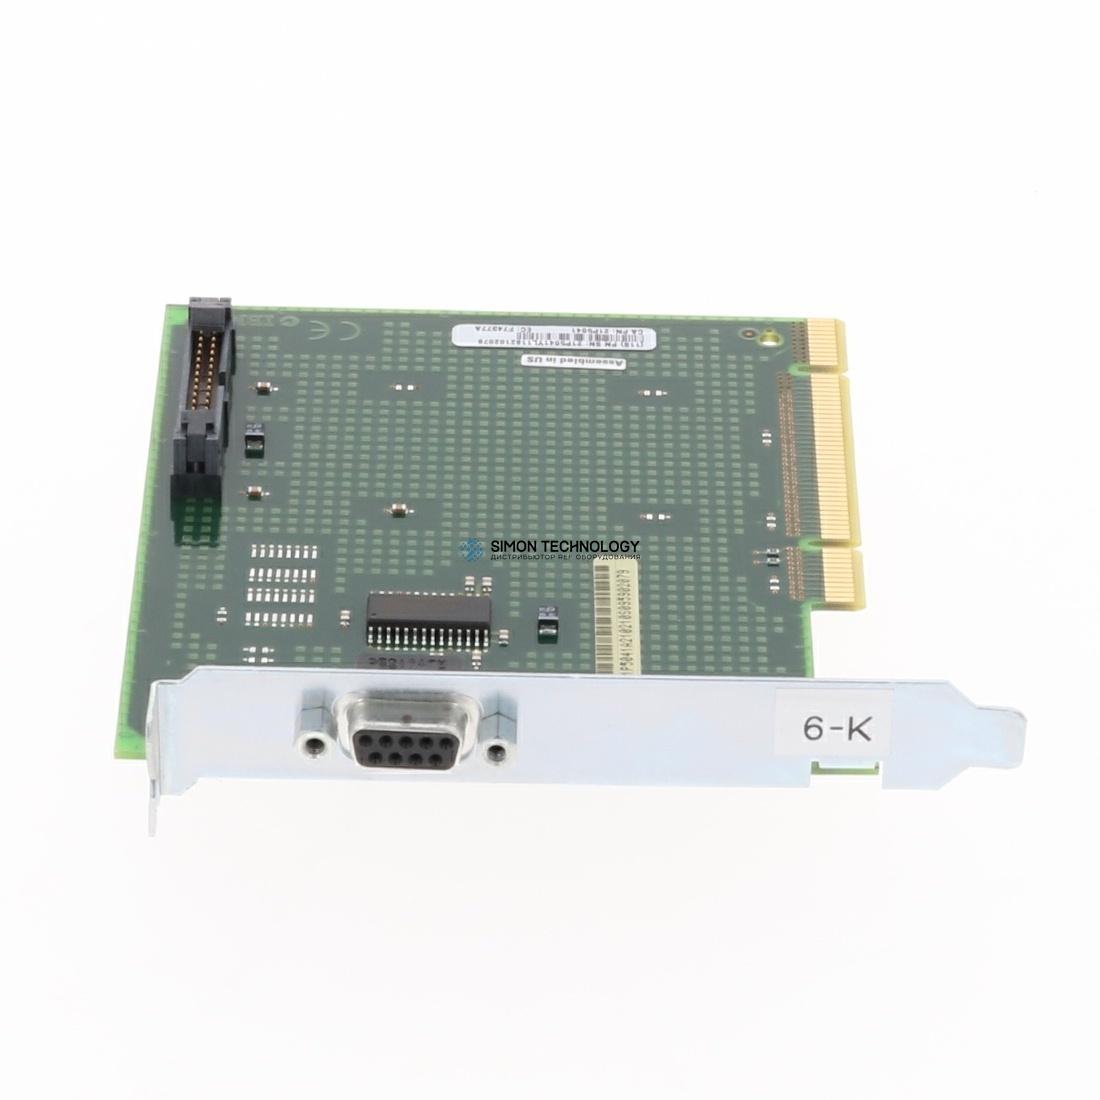 IBM SP Control W/S Adapter (6-K) (21P5041)